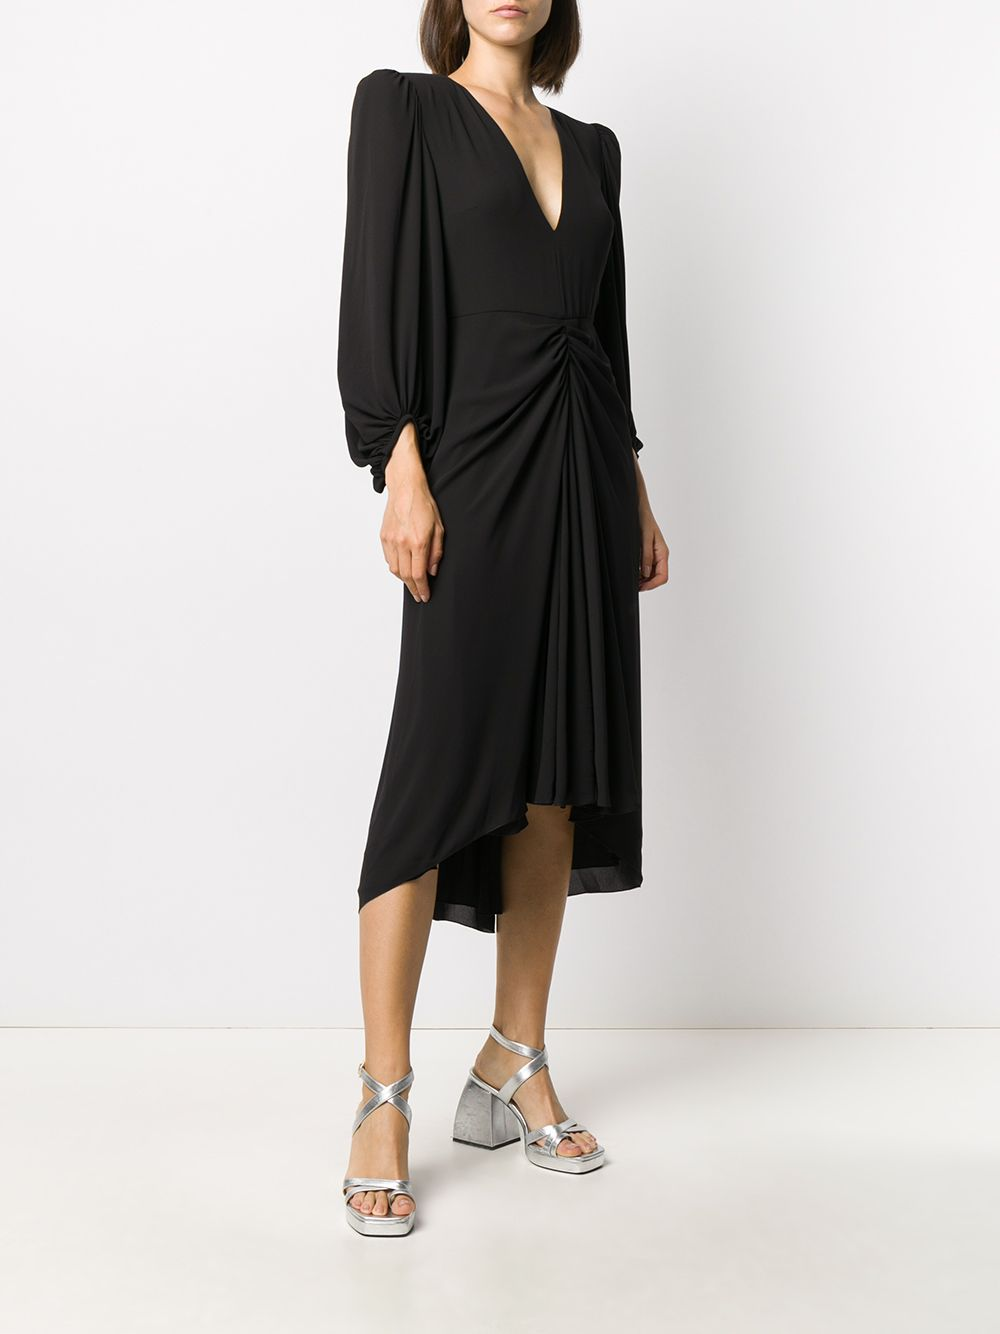 PHILOSOPHY di LORENZO SERAFINI | Dress | A04017118555